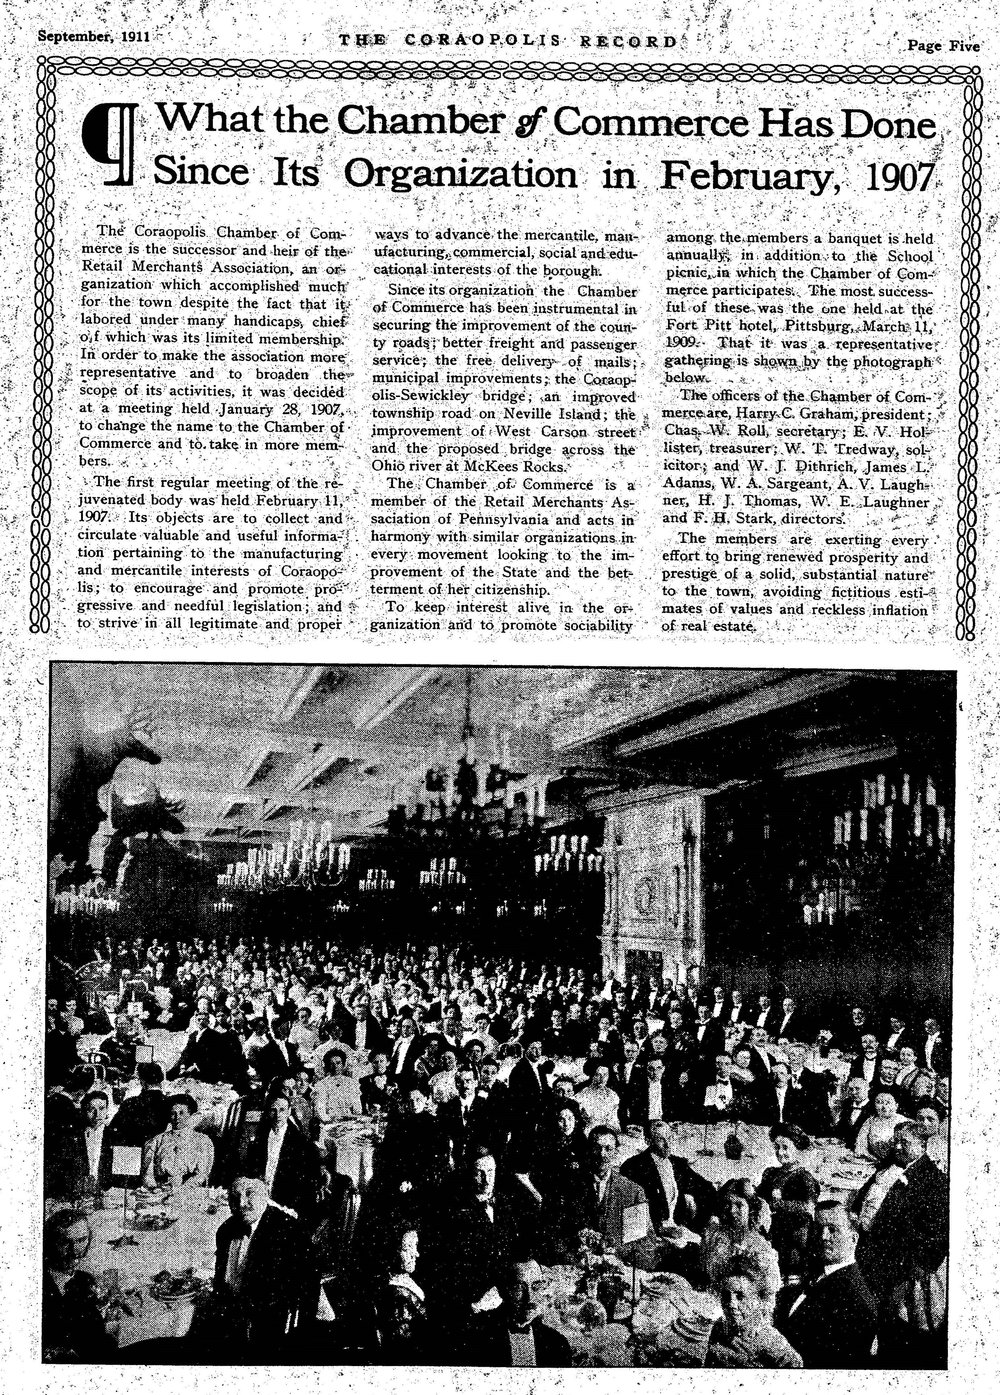 1911-09-15 The Coraopolis Record, page 5